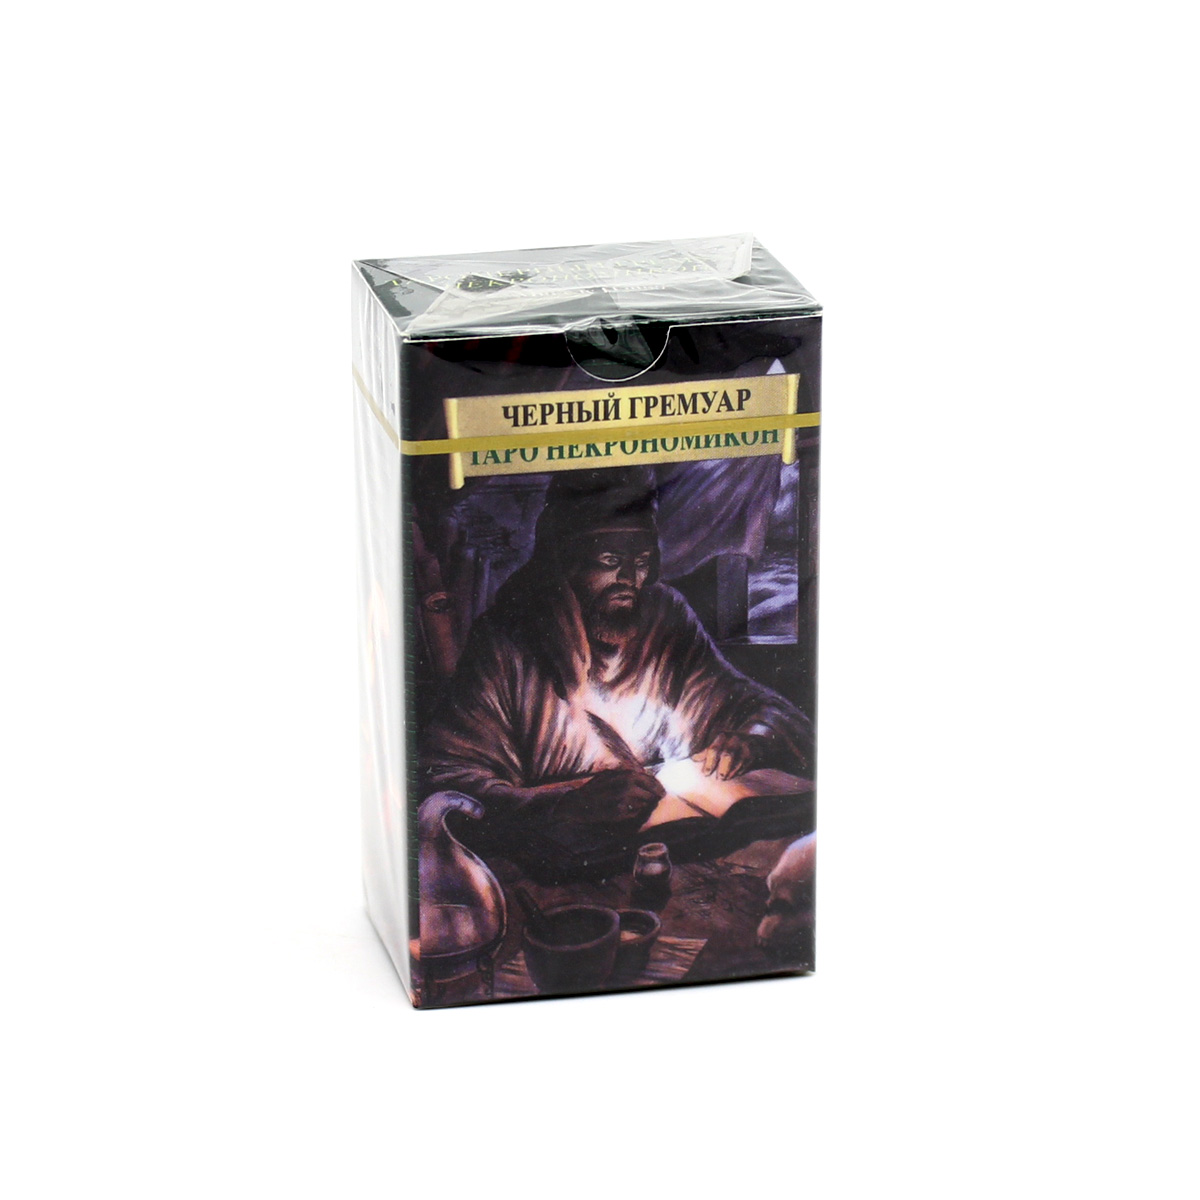 Таро Черный Гремуар Некрономикон, 78 карт, мини, карманный вариант, 7.5 см х 4.5 см